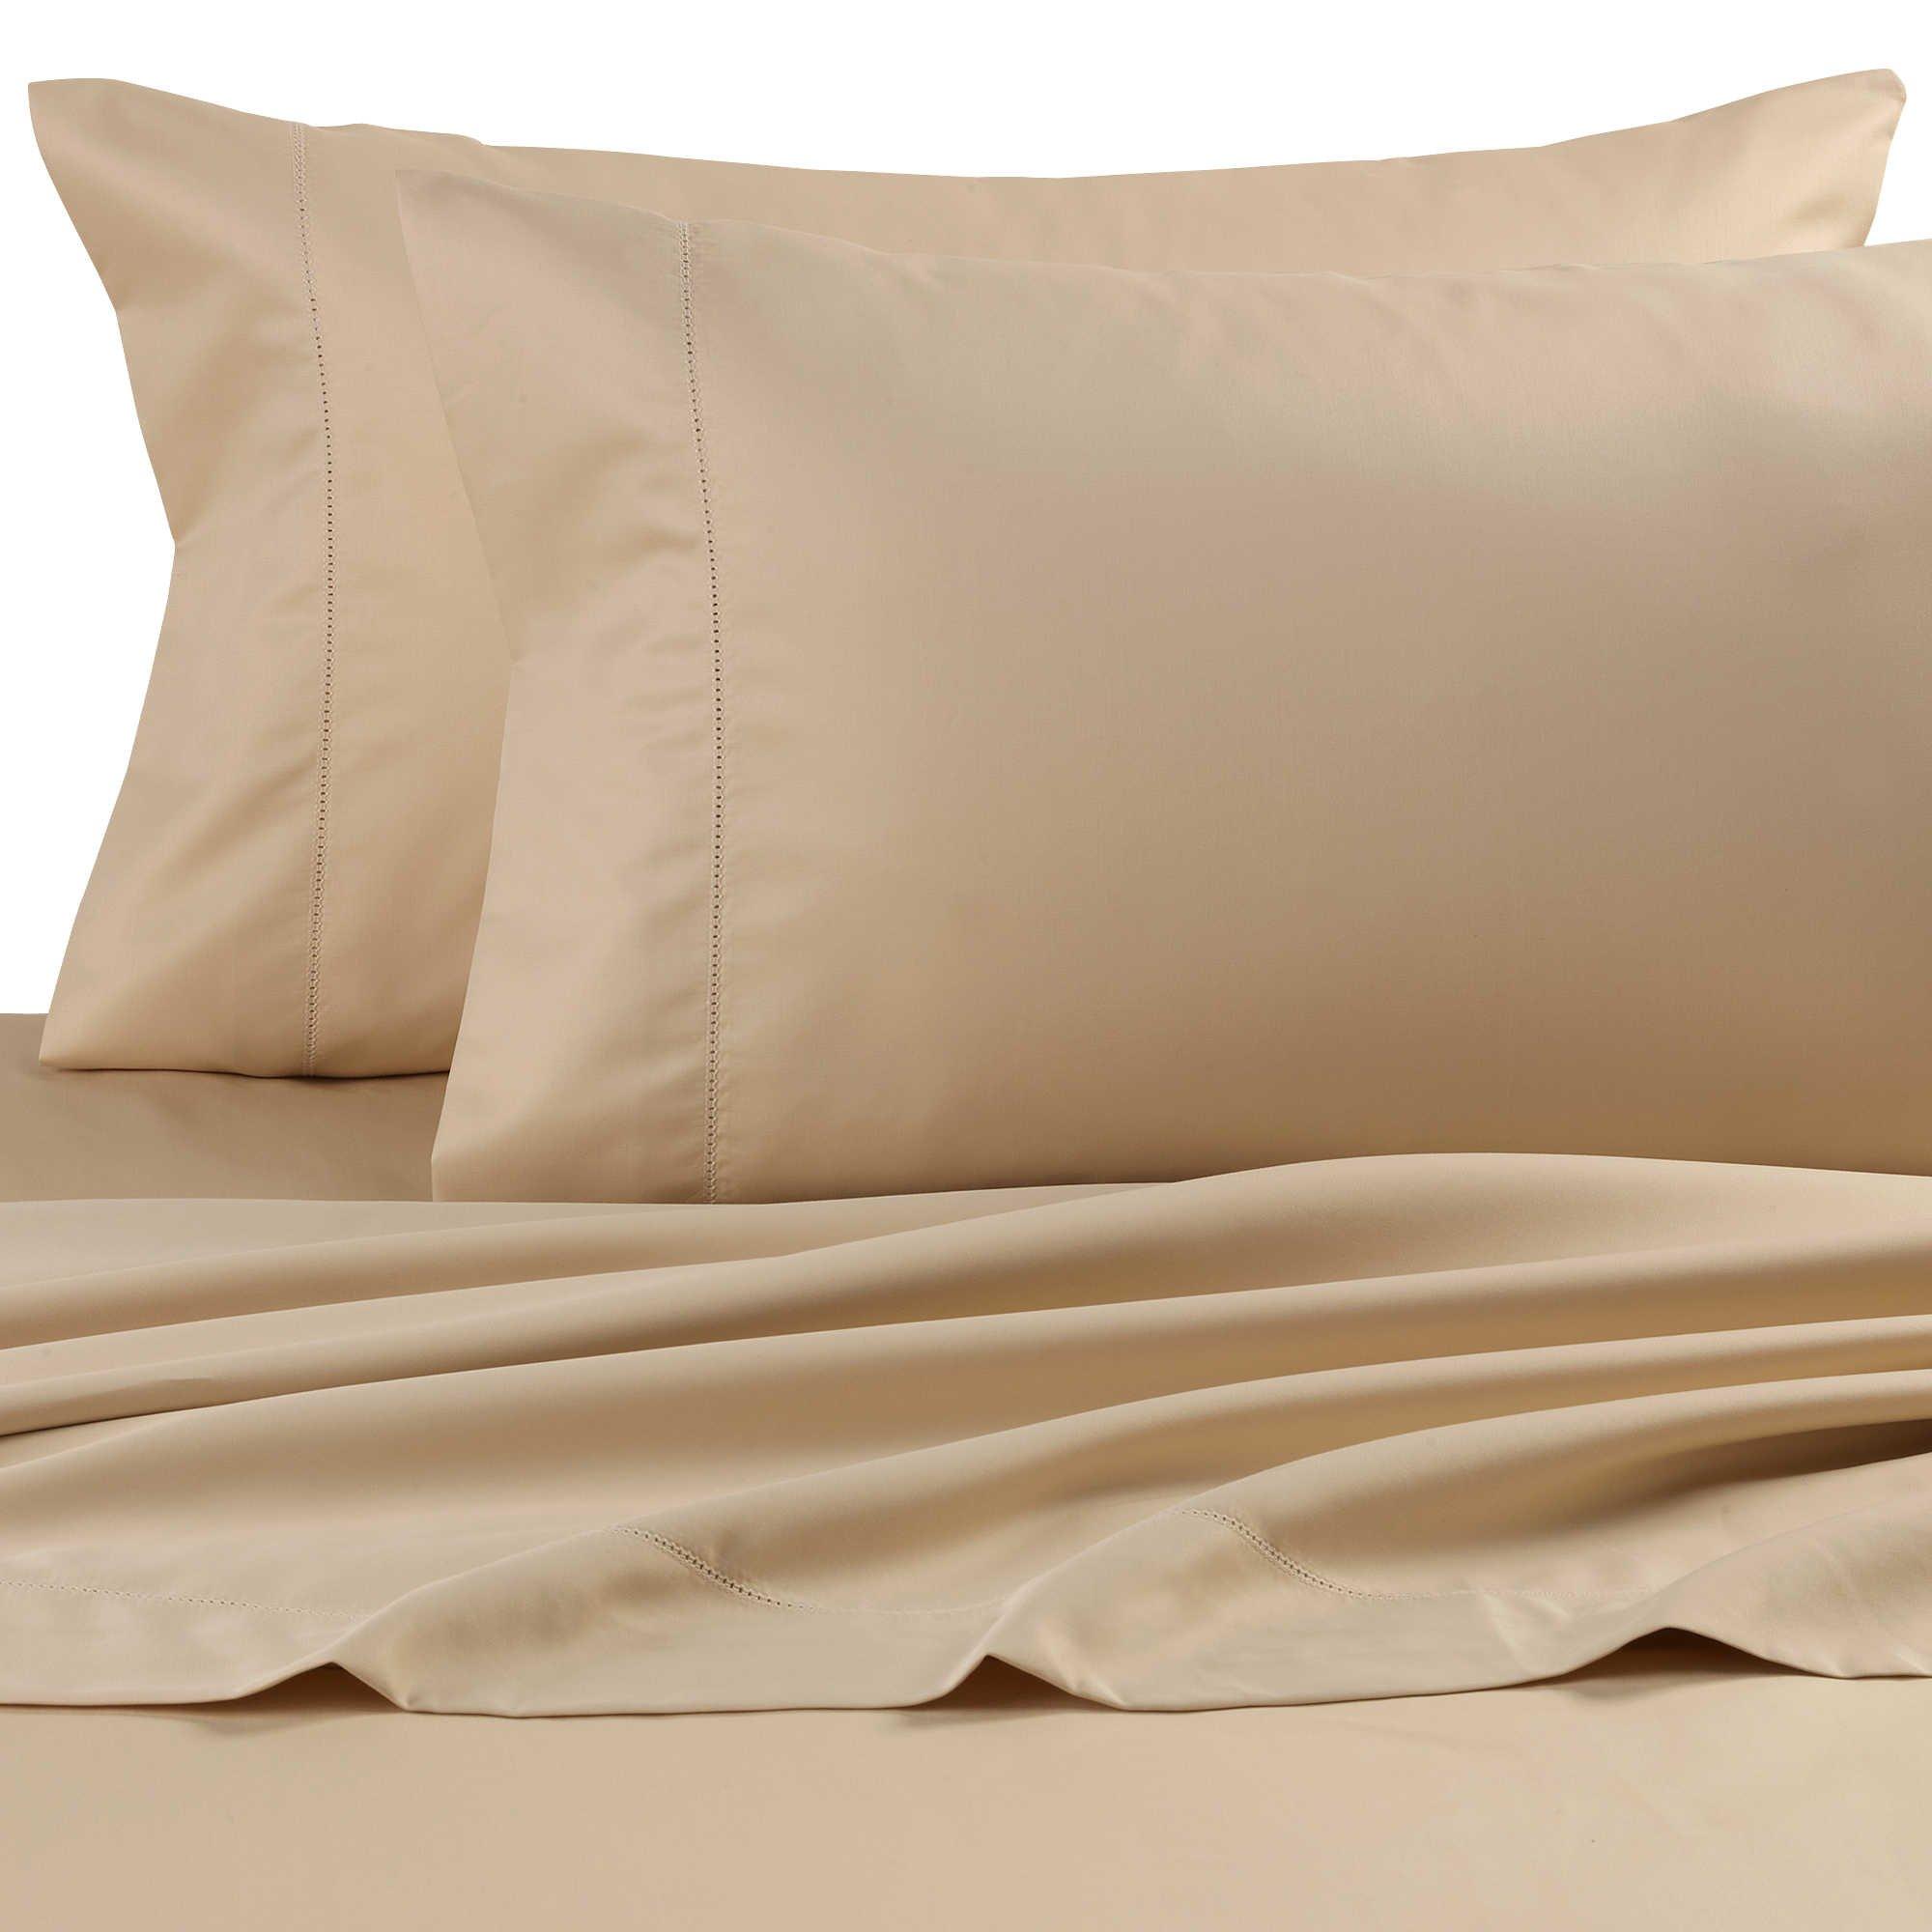 Wamsutta Dream Zone Chamois King Sheet Set, Dark Cream, 750 Thread Count